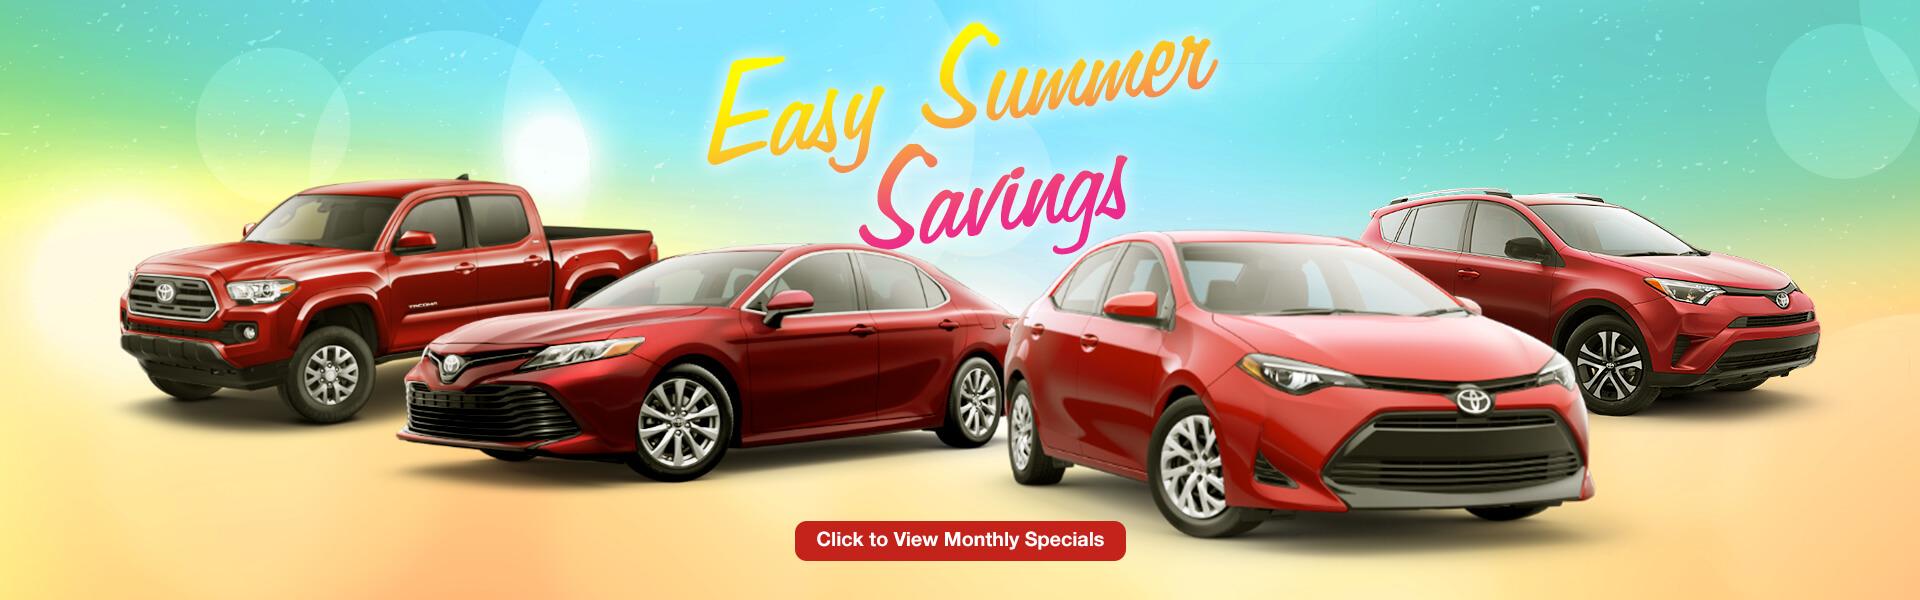 Toyota Easy Summer Savings